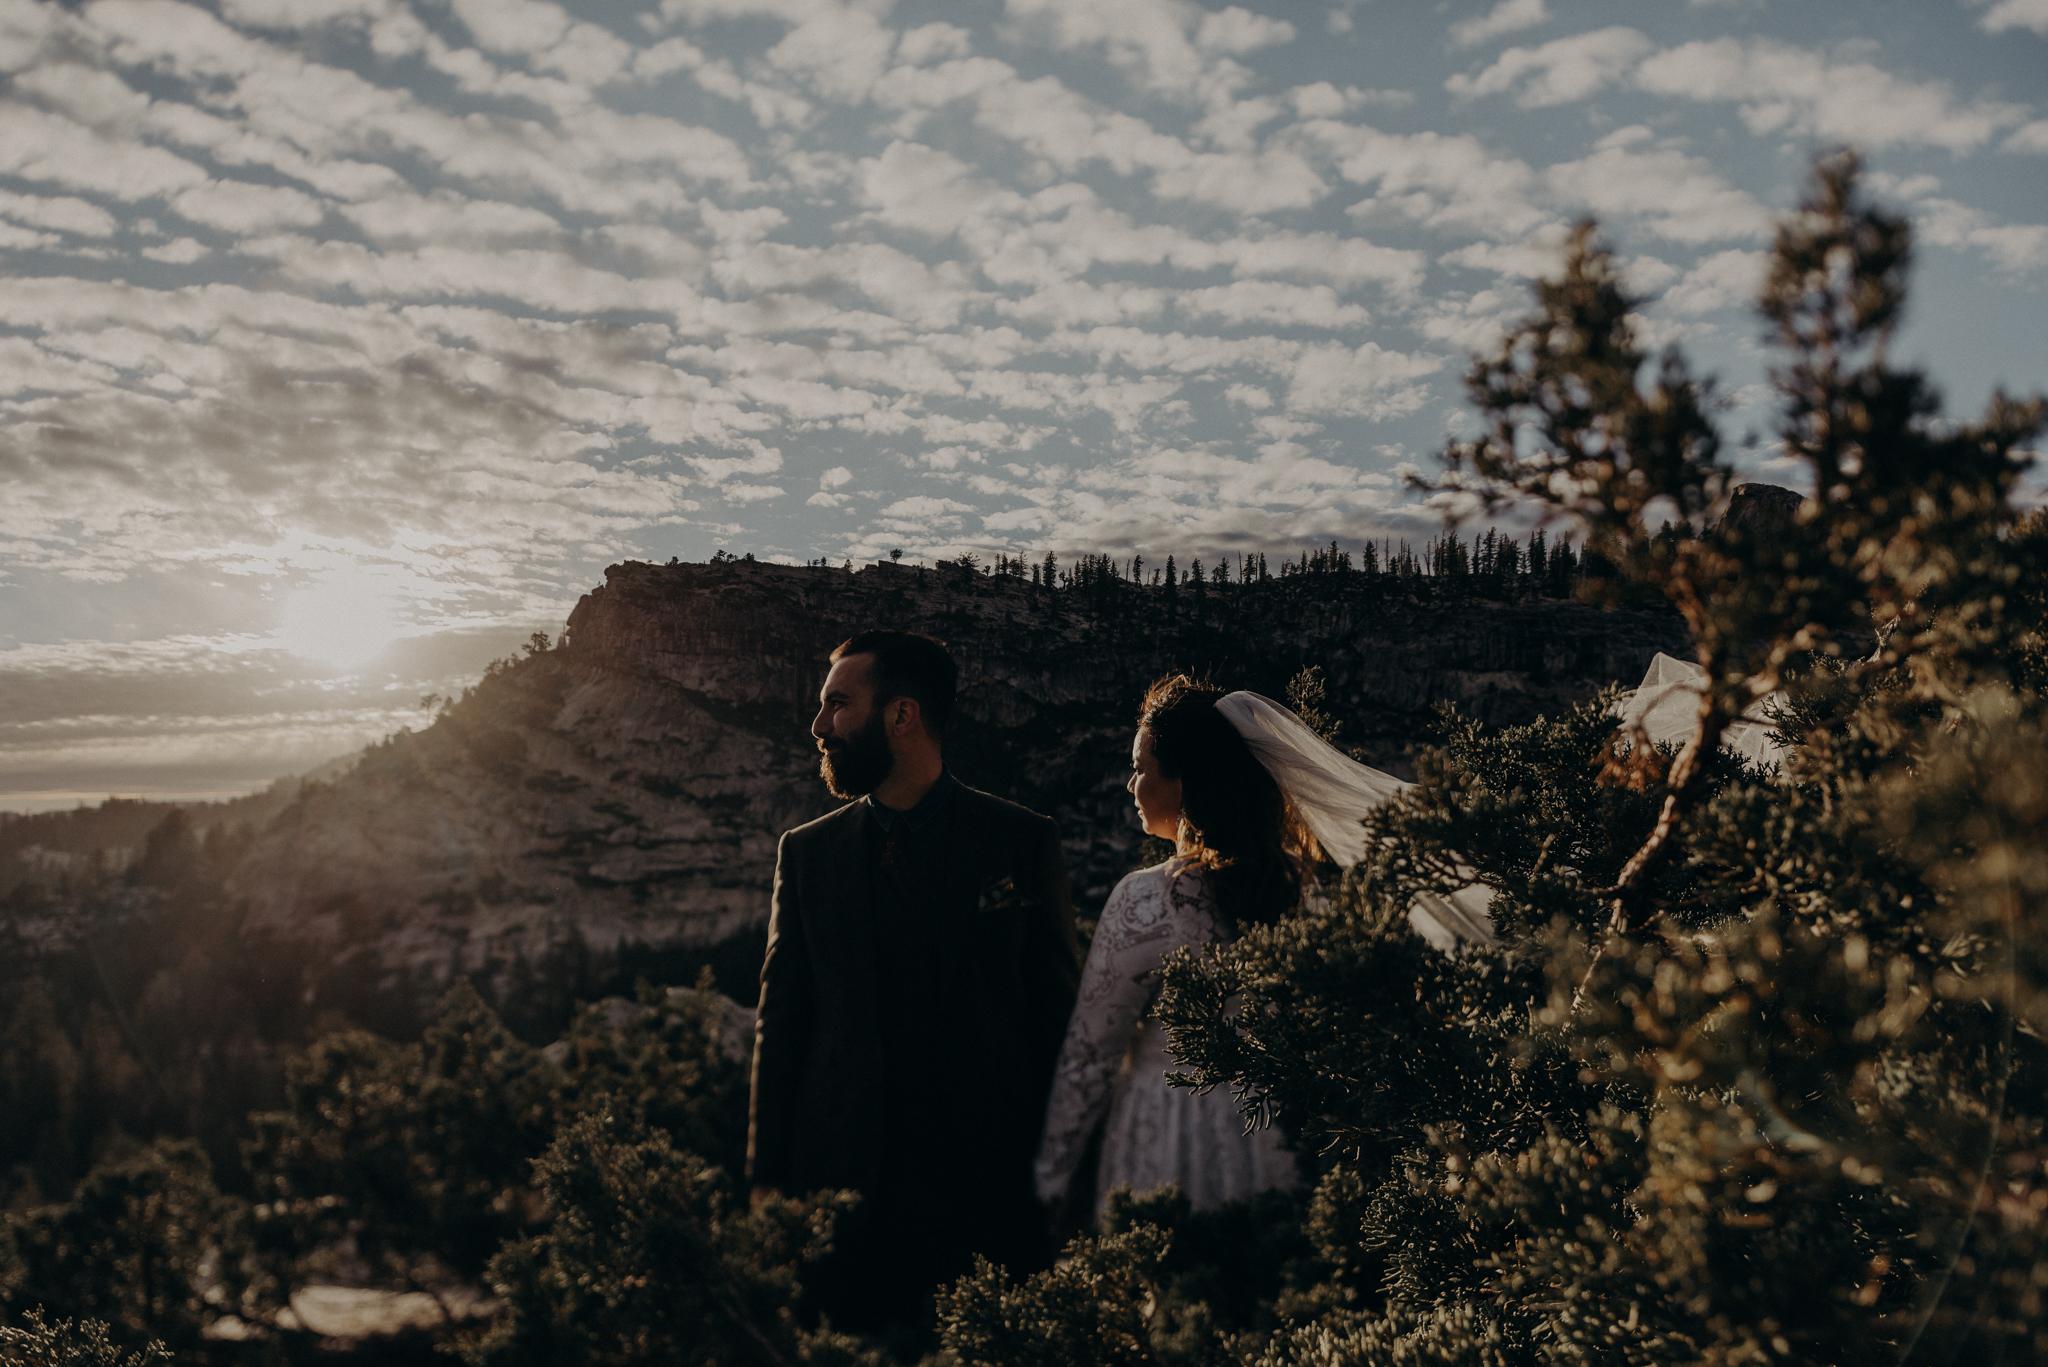 Yosemite Elopement Photographer - Evergreen Lodge Wedding Photographer - IsaiahAndTaylor.com-033.jpg